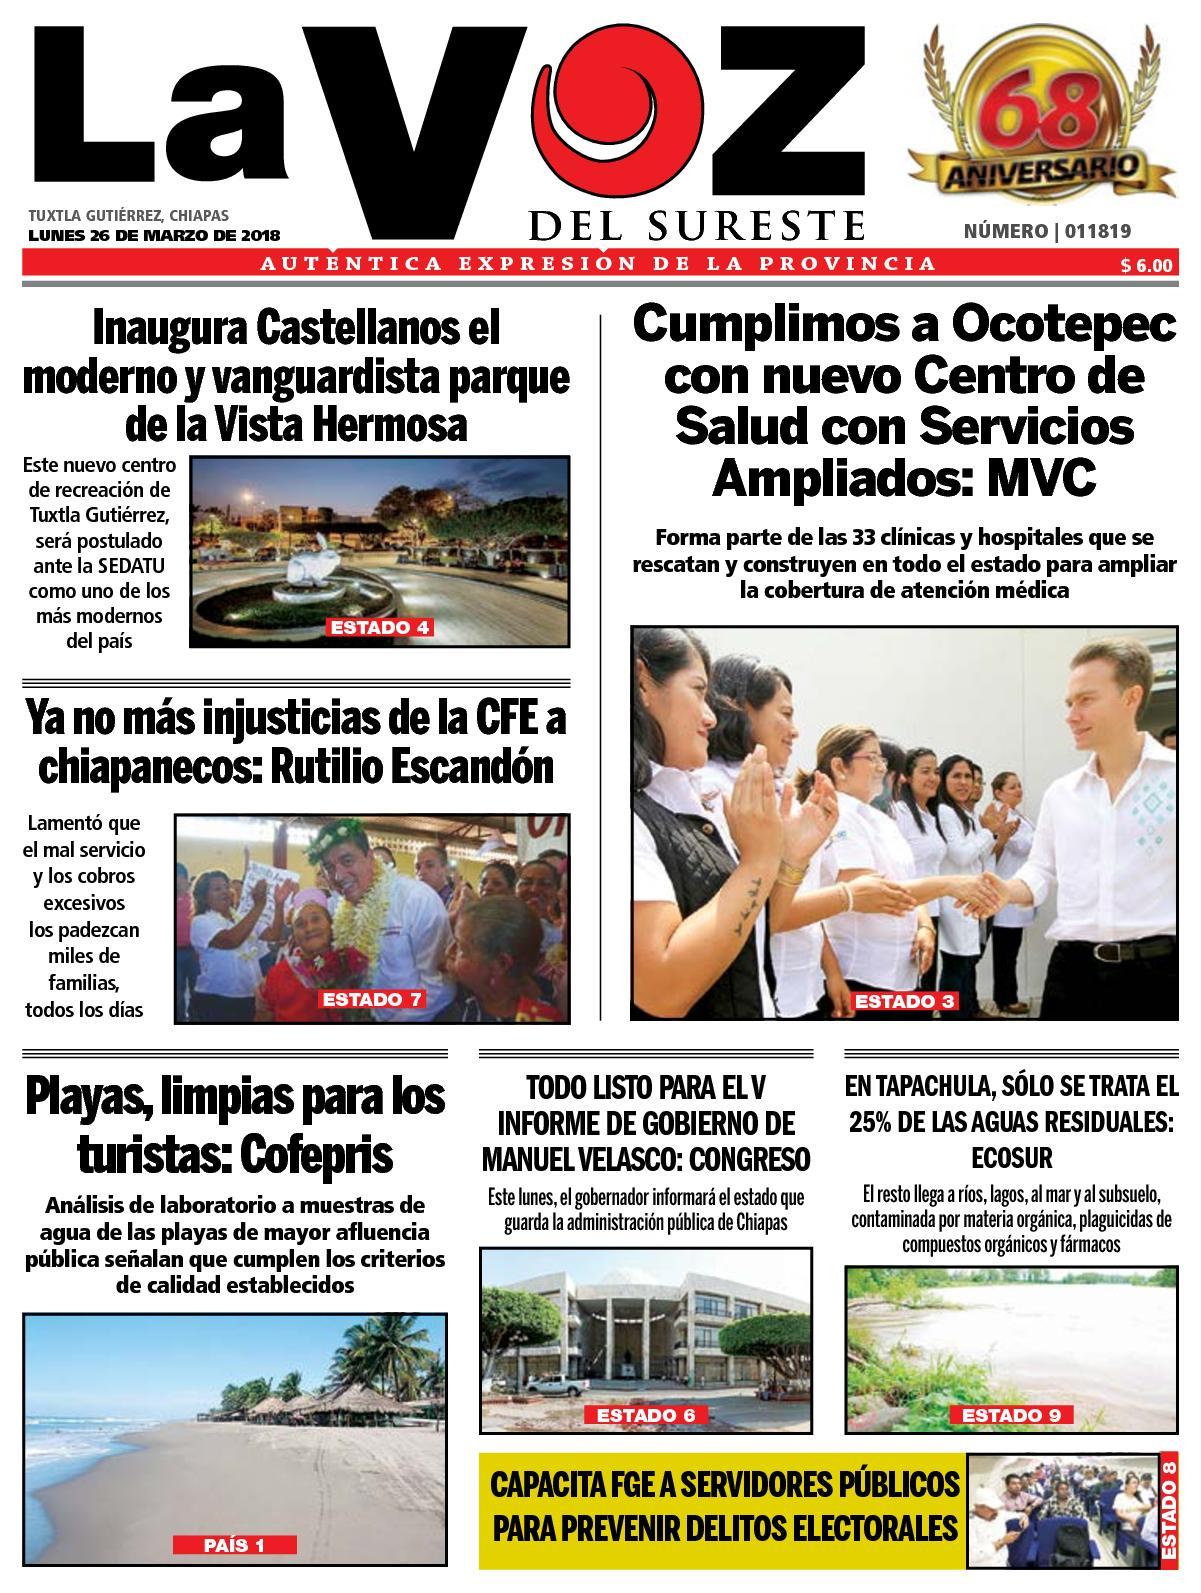 Calaméo - Diario La Voz del Sureste c23606779bf4e